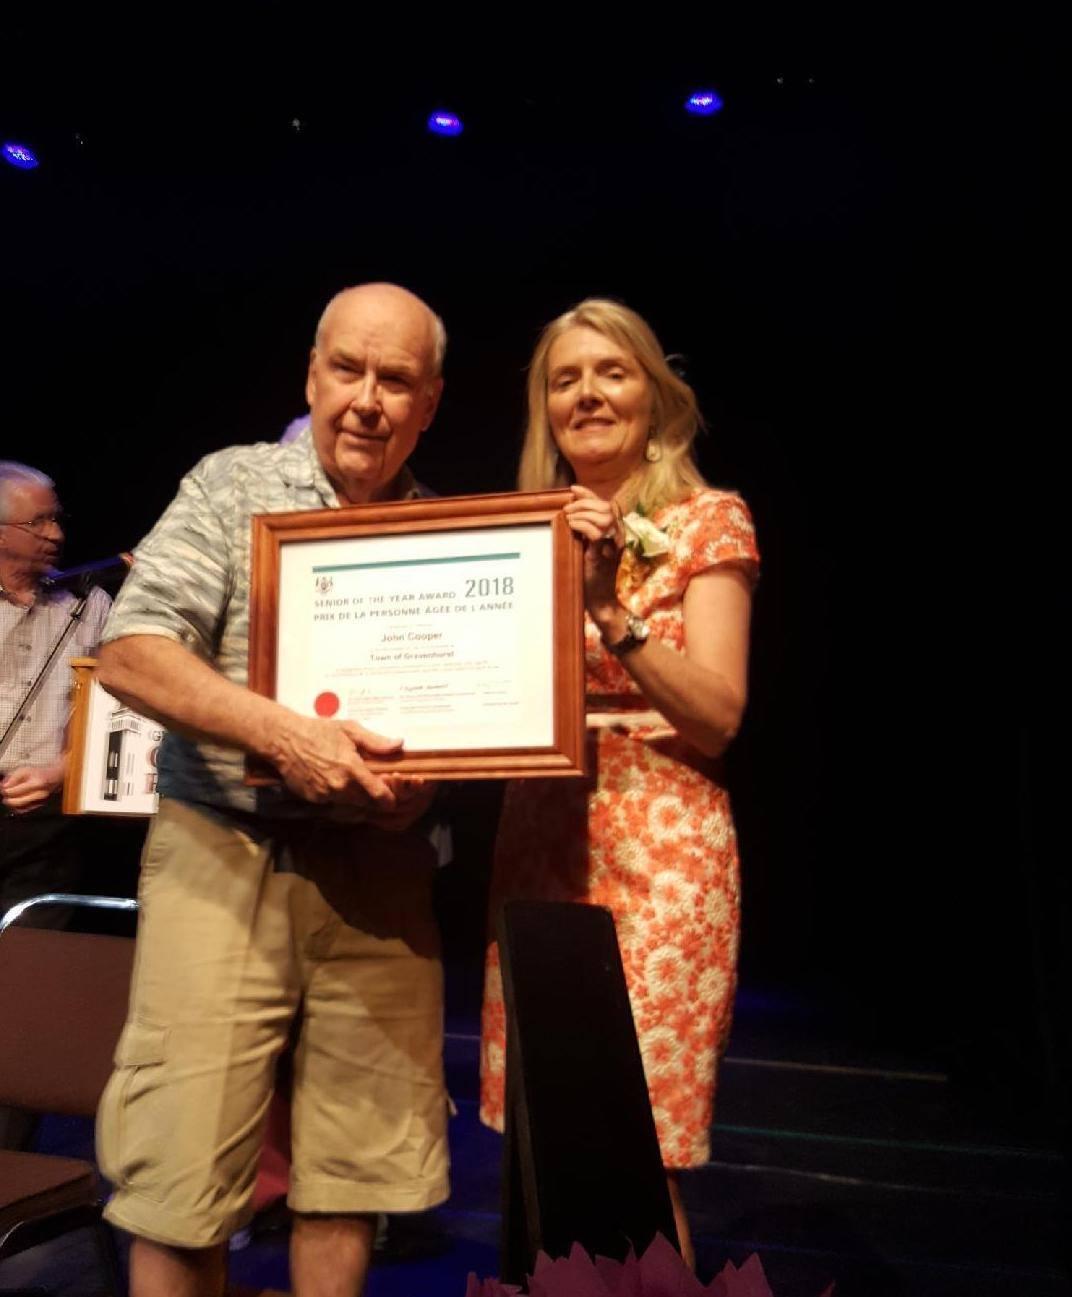 Gravenhurst Senior of the Year Award presented to John Cooper by Mayor Paisley Donaldson.